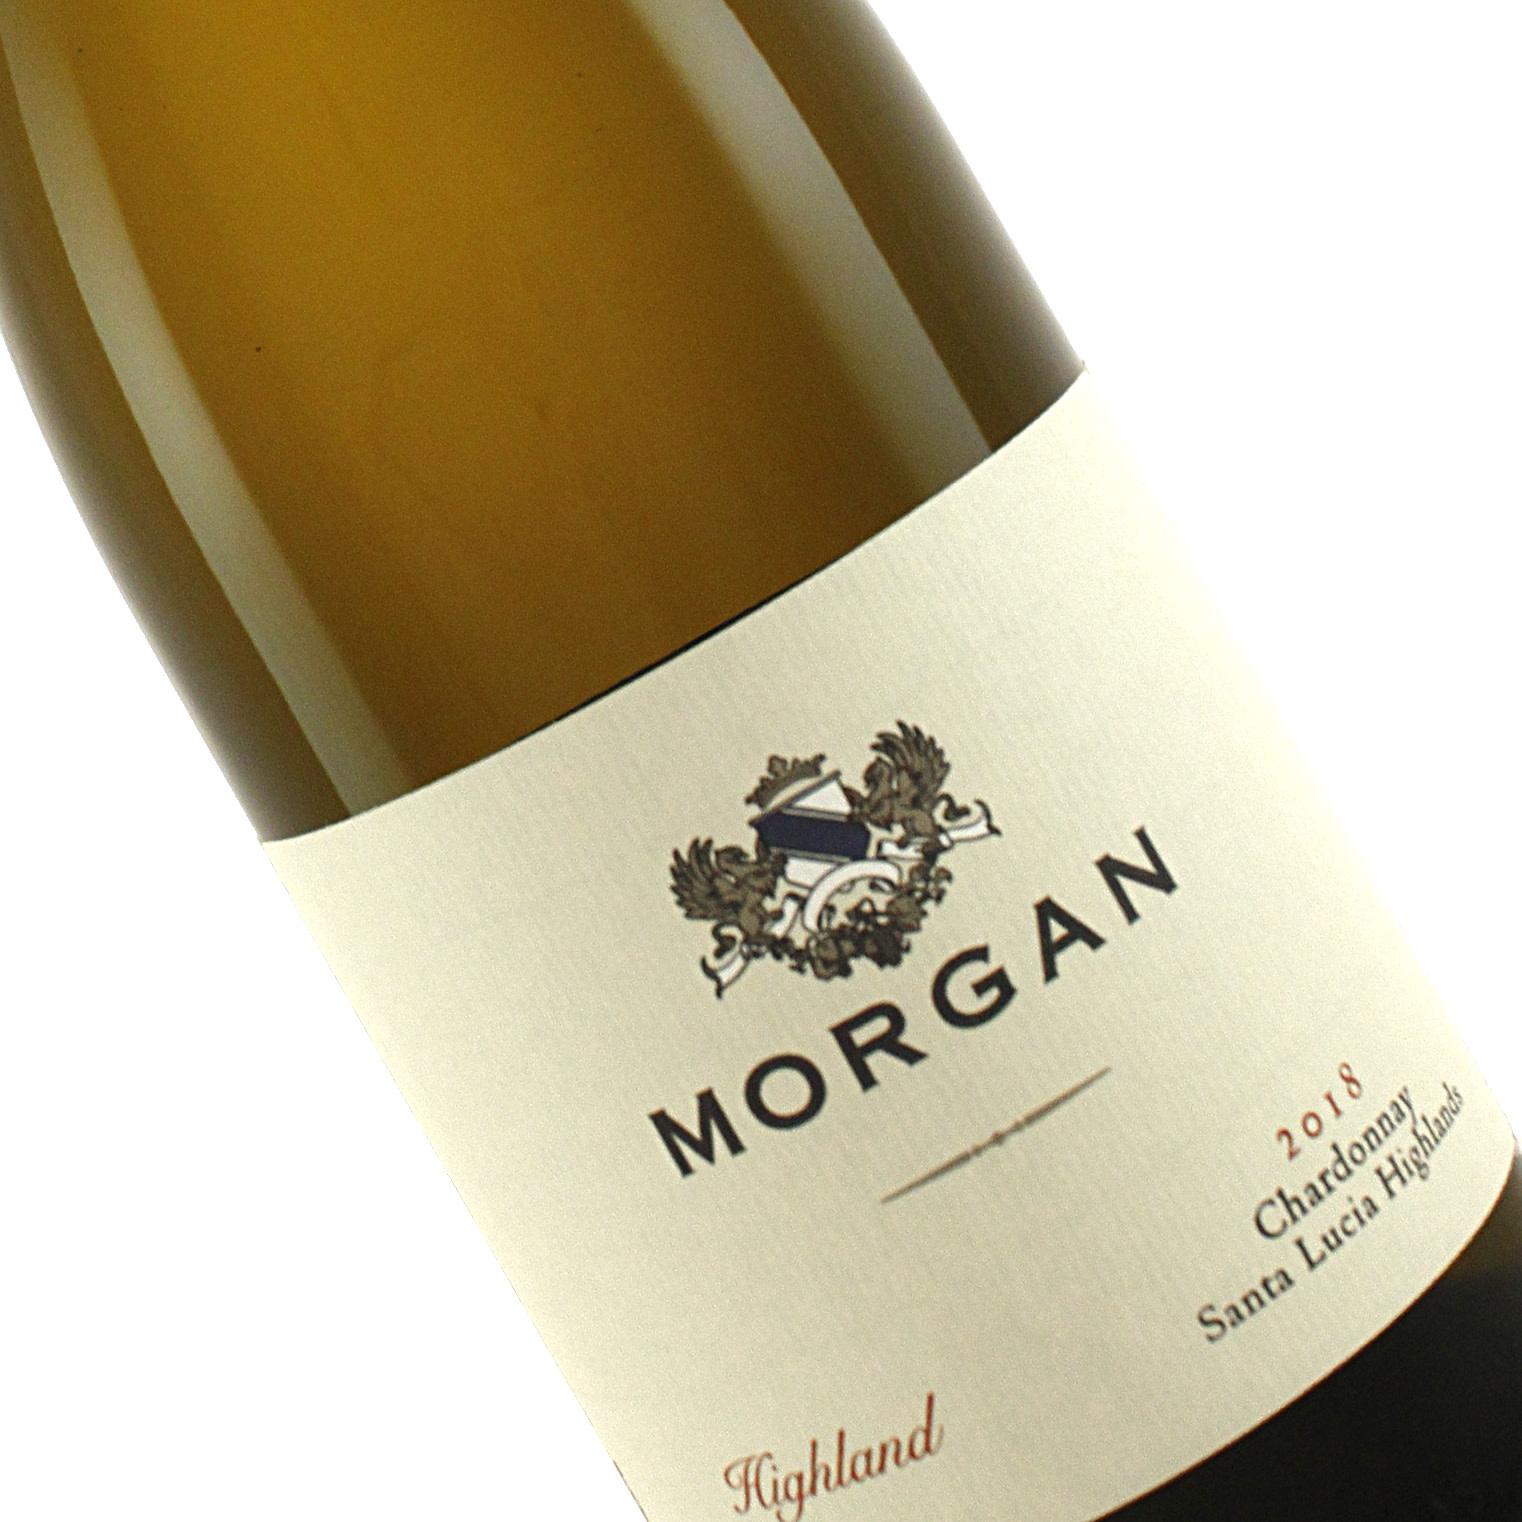 "Morgan 2018 Chardonnay ""Highland"", Santa Lucia Highlands"